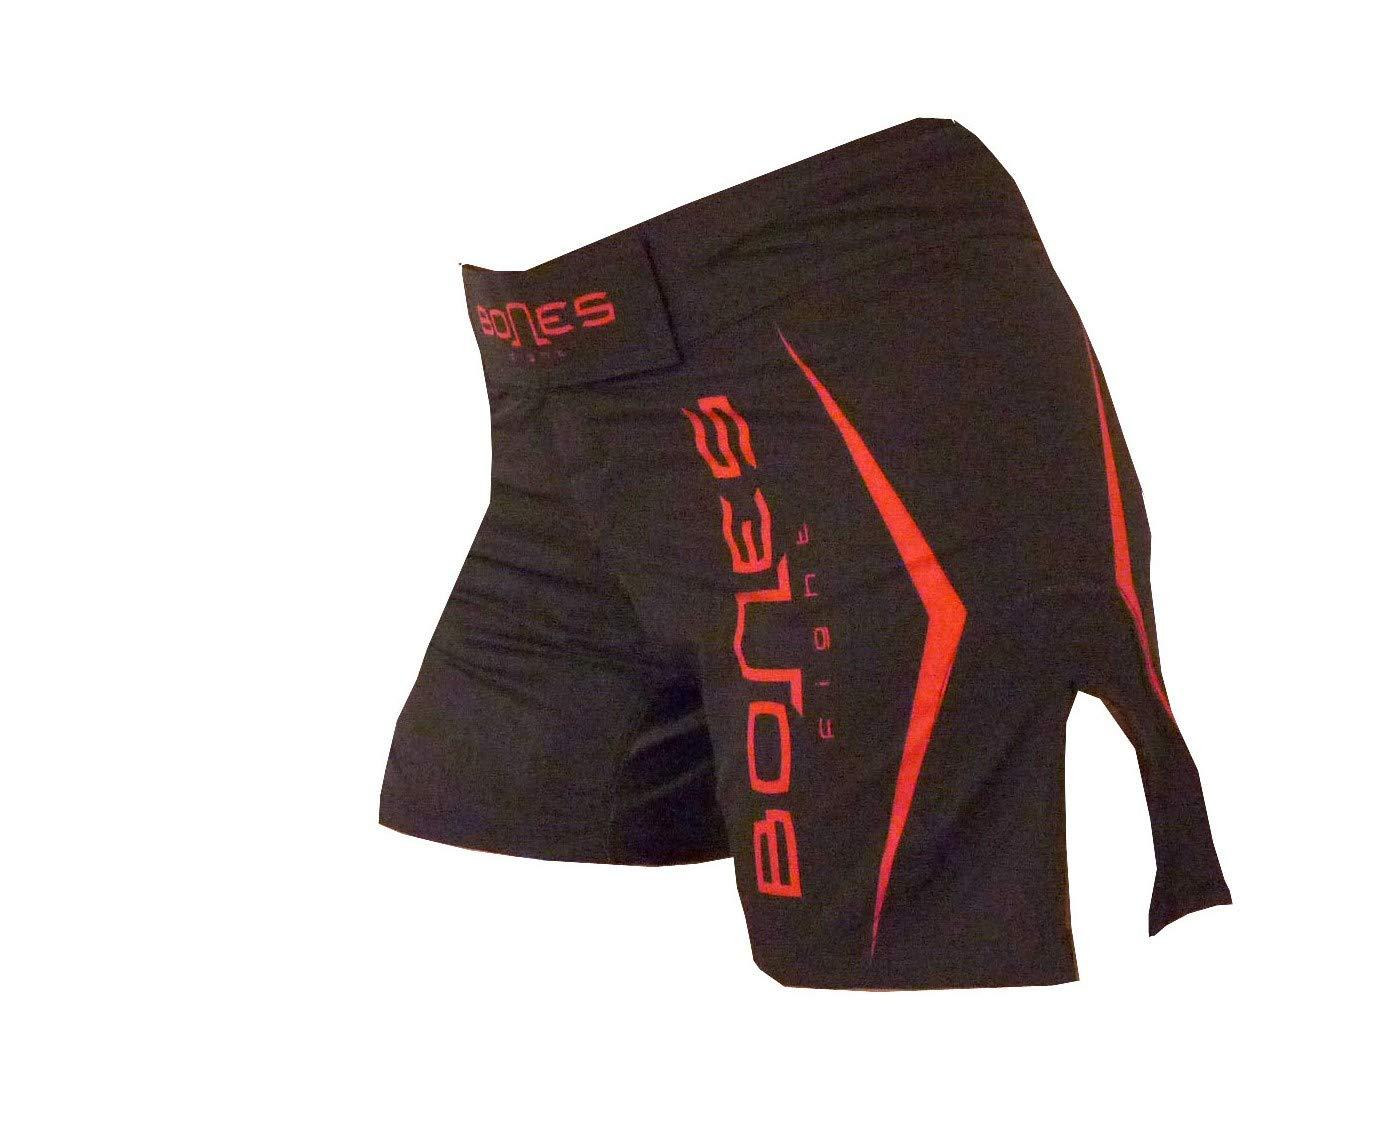 Bones Fight Shorts, Woman´s MMA Short, BJJ, Woman´s Grappling Short, Cross fit, Free Fight Short, Black